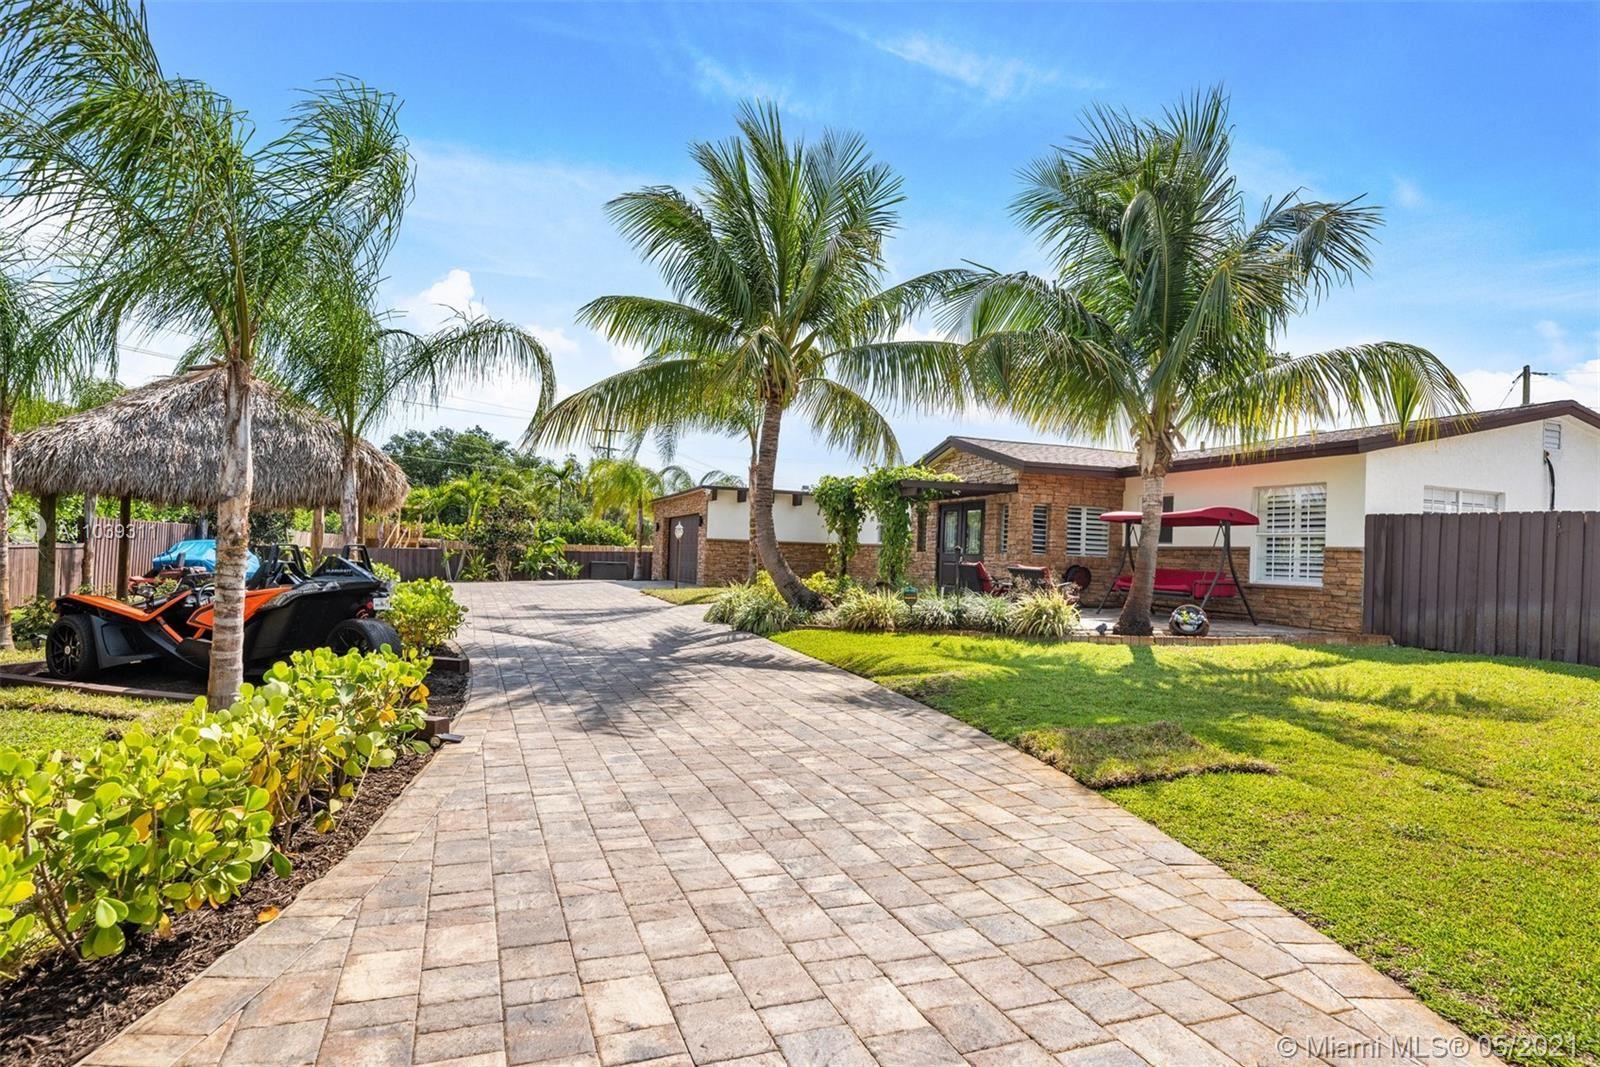 Photo of 500 NW 7th St, Boca Raton, FL 33432 (MLS # A11039311)